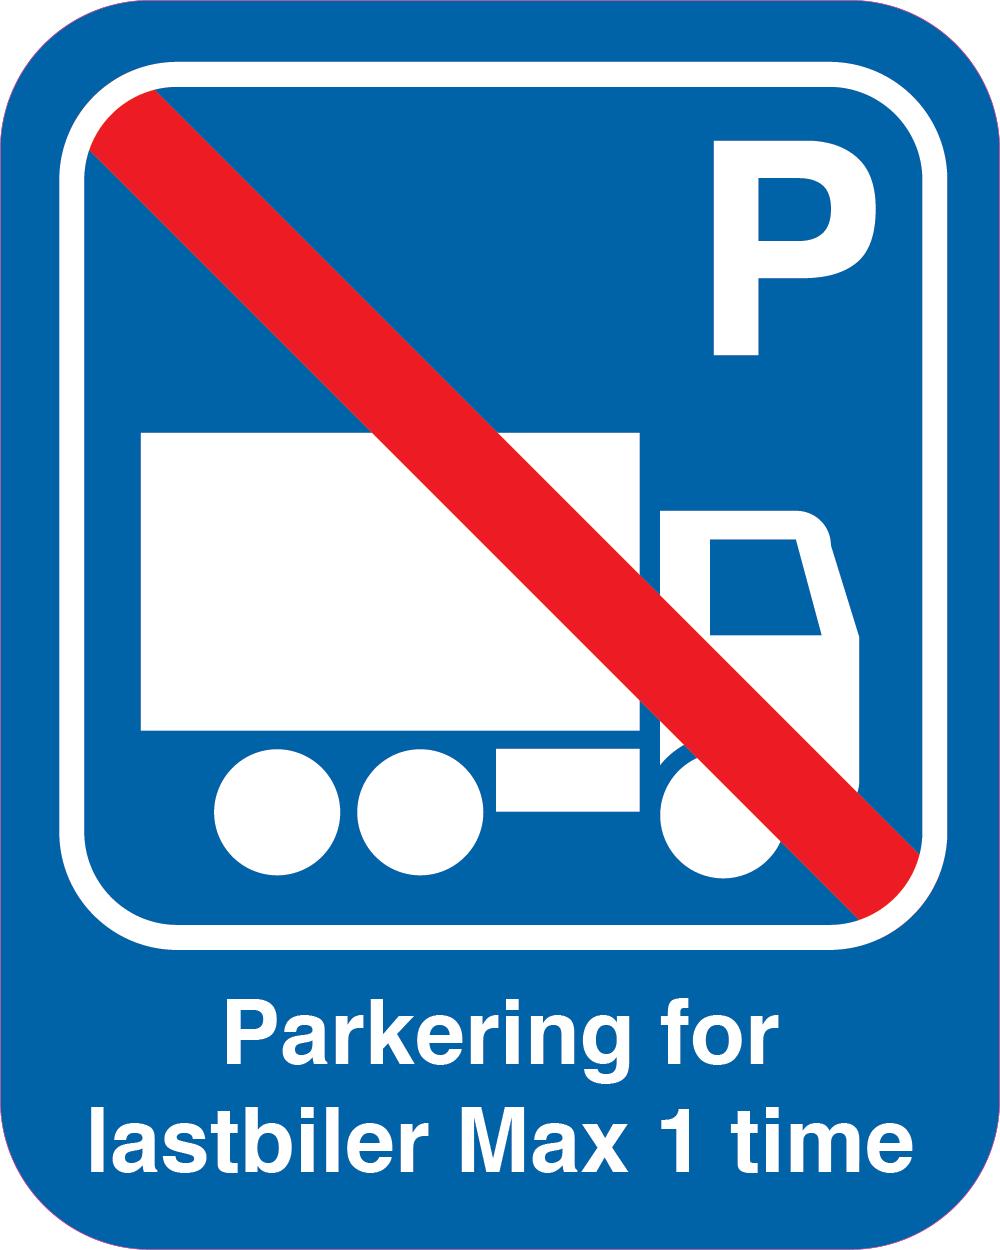 Parkering for lastbiler Max 1 time